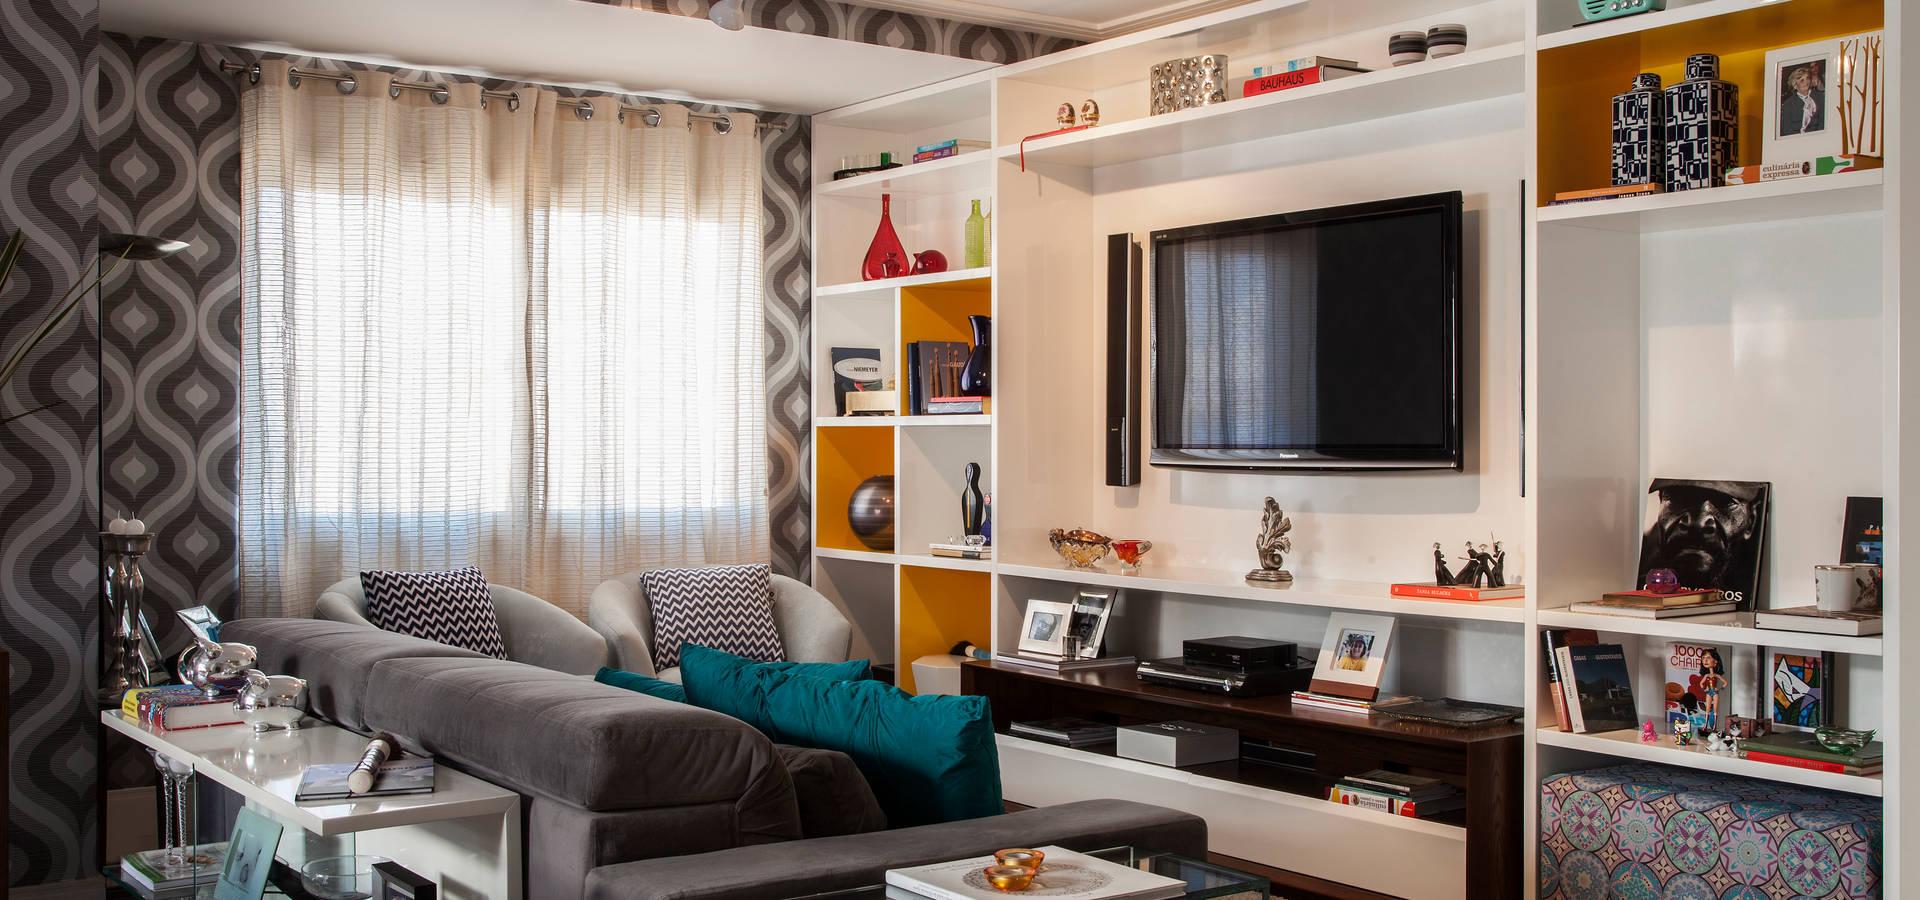 Biarari e Rodrigues Arquitetura e Interiores